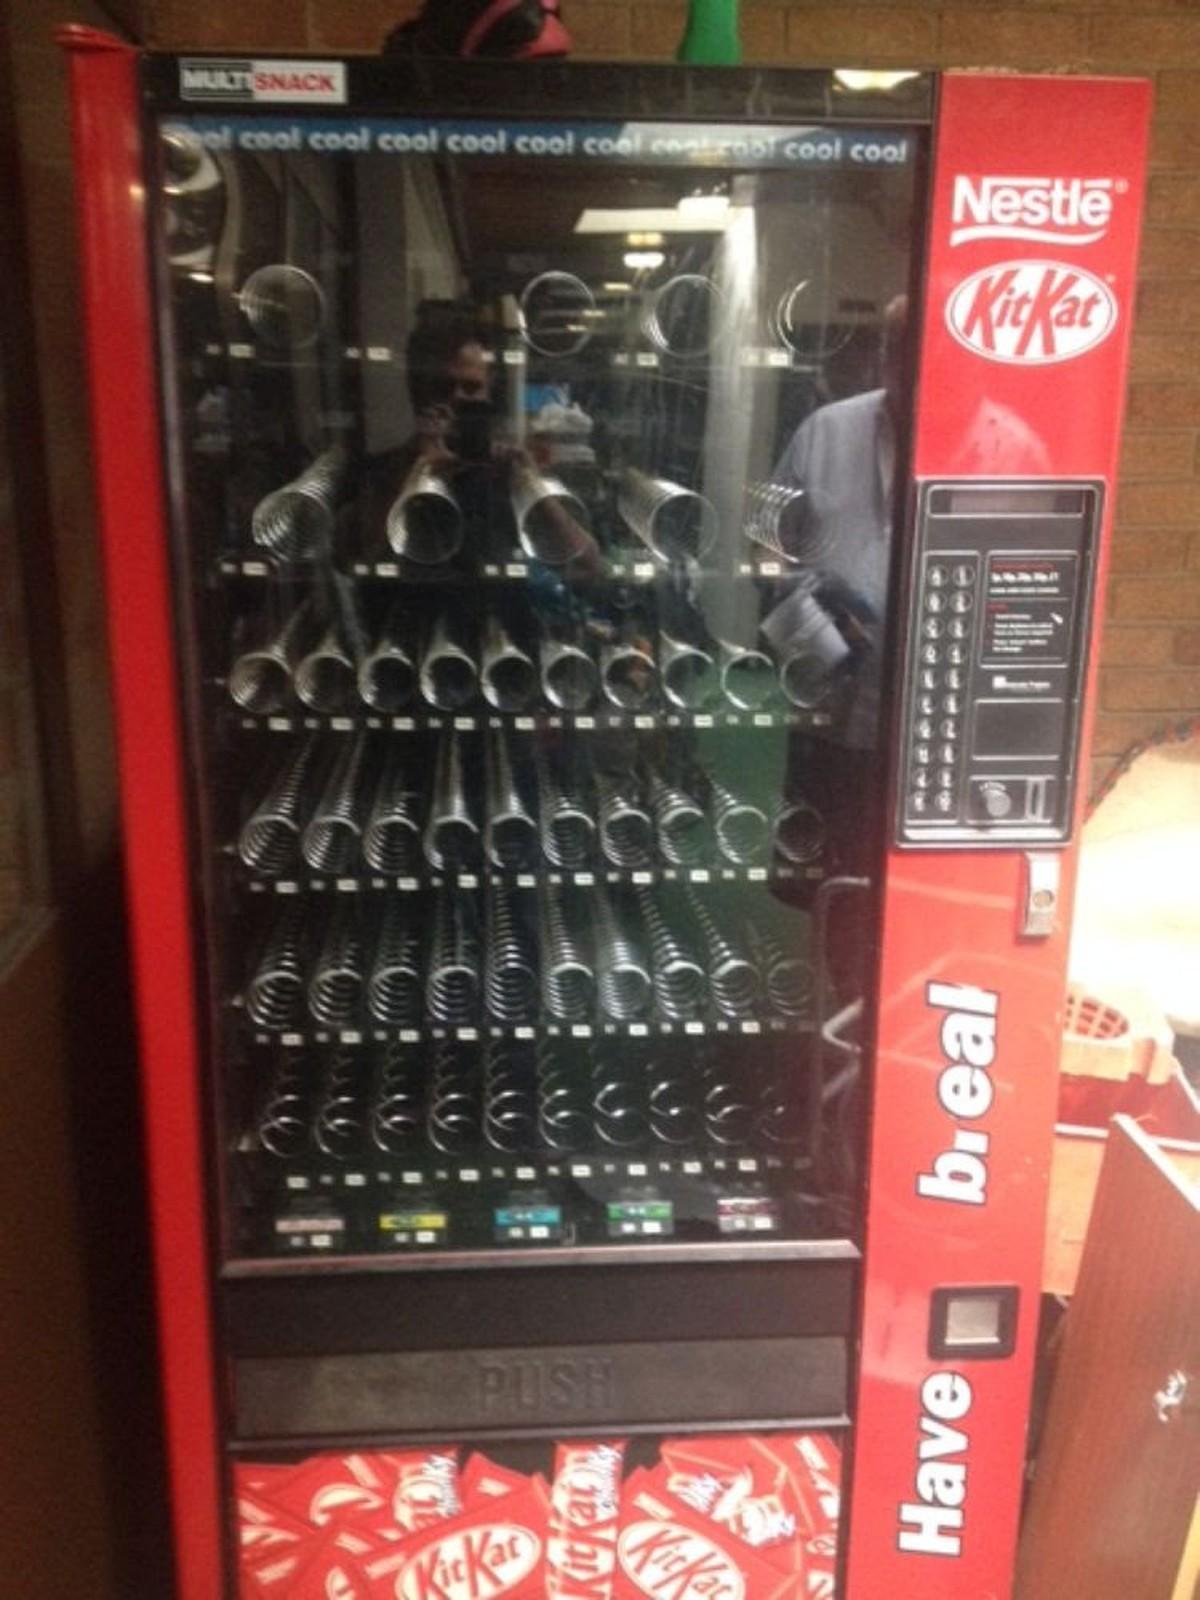 Secondhand Catering Equipment Vending Machines Kit Kat